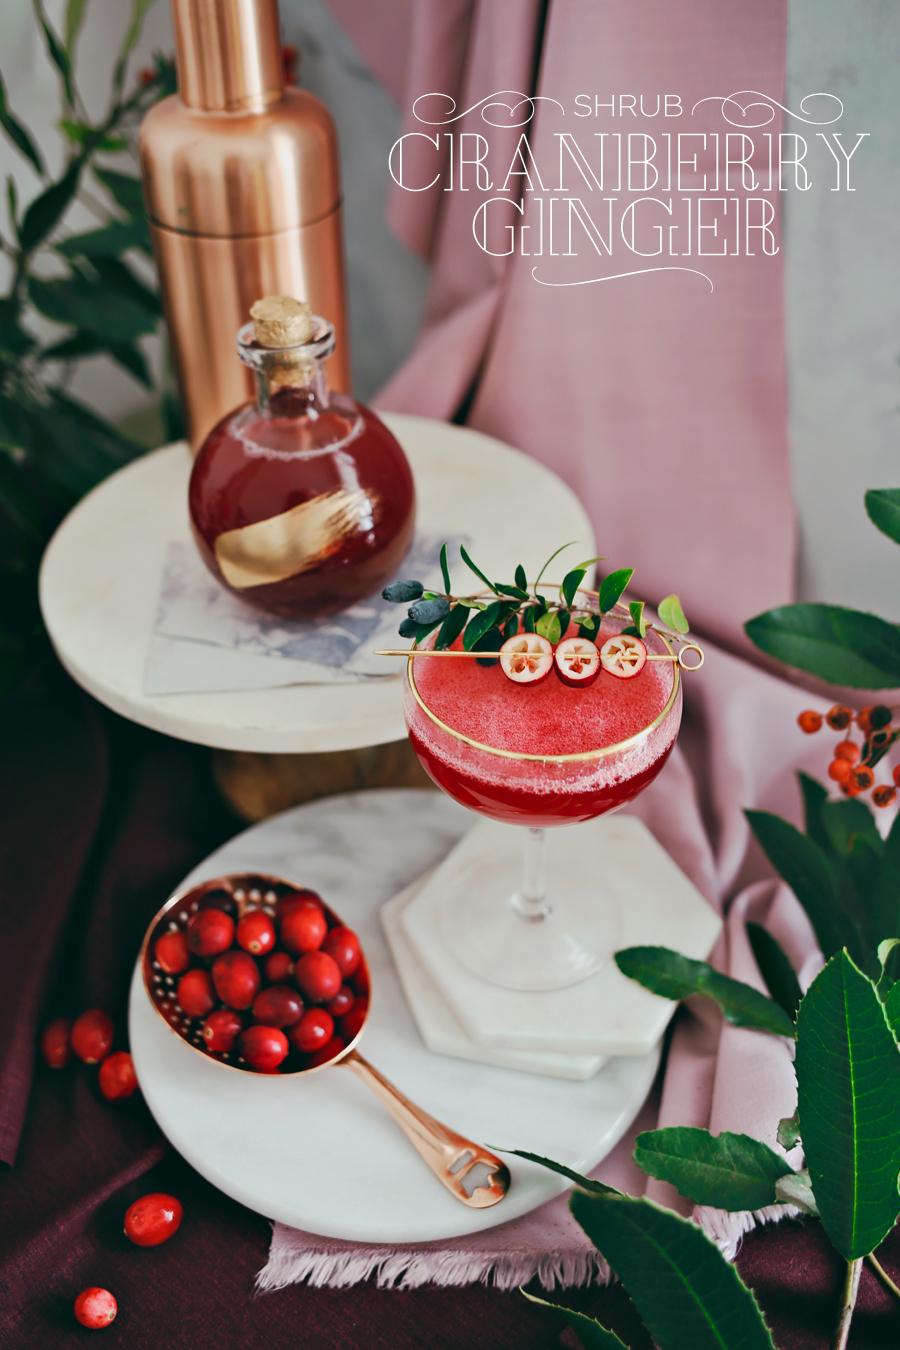 02_Cranberry-Ginger-Shrub-Cocktail-Dine-X-Design.jpg